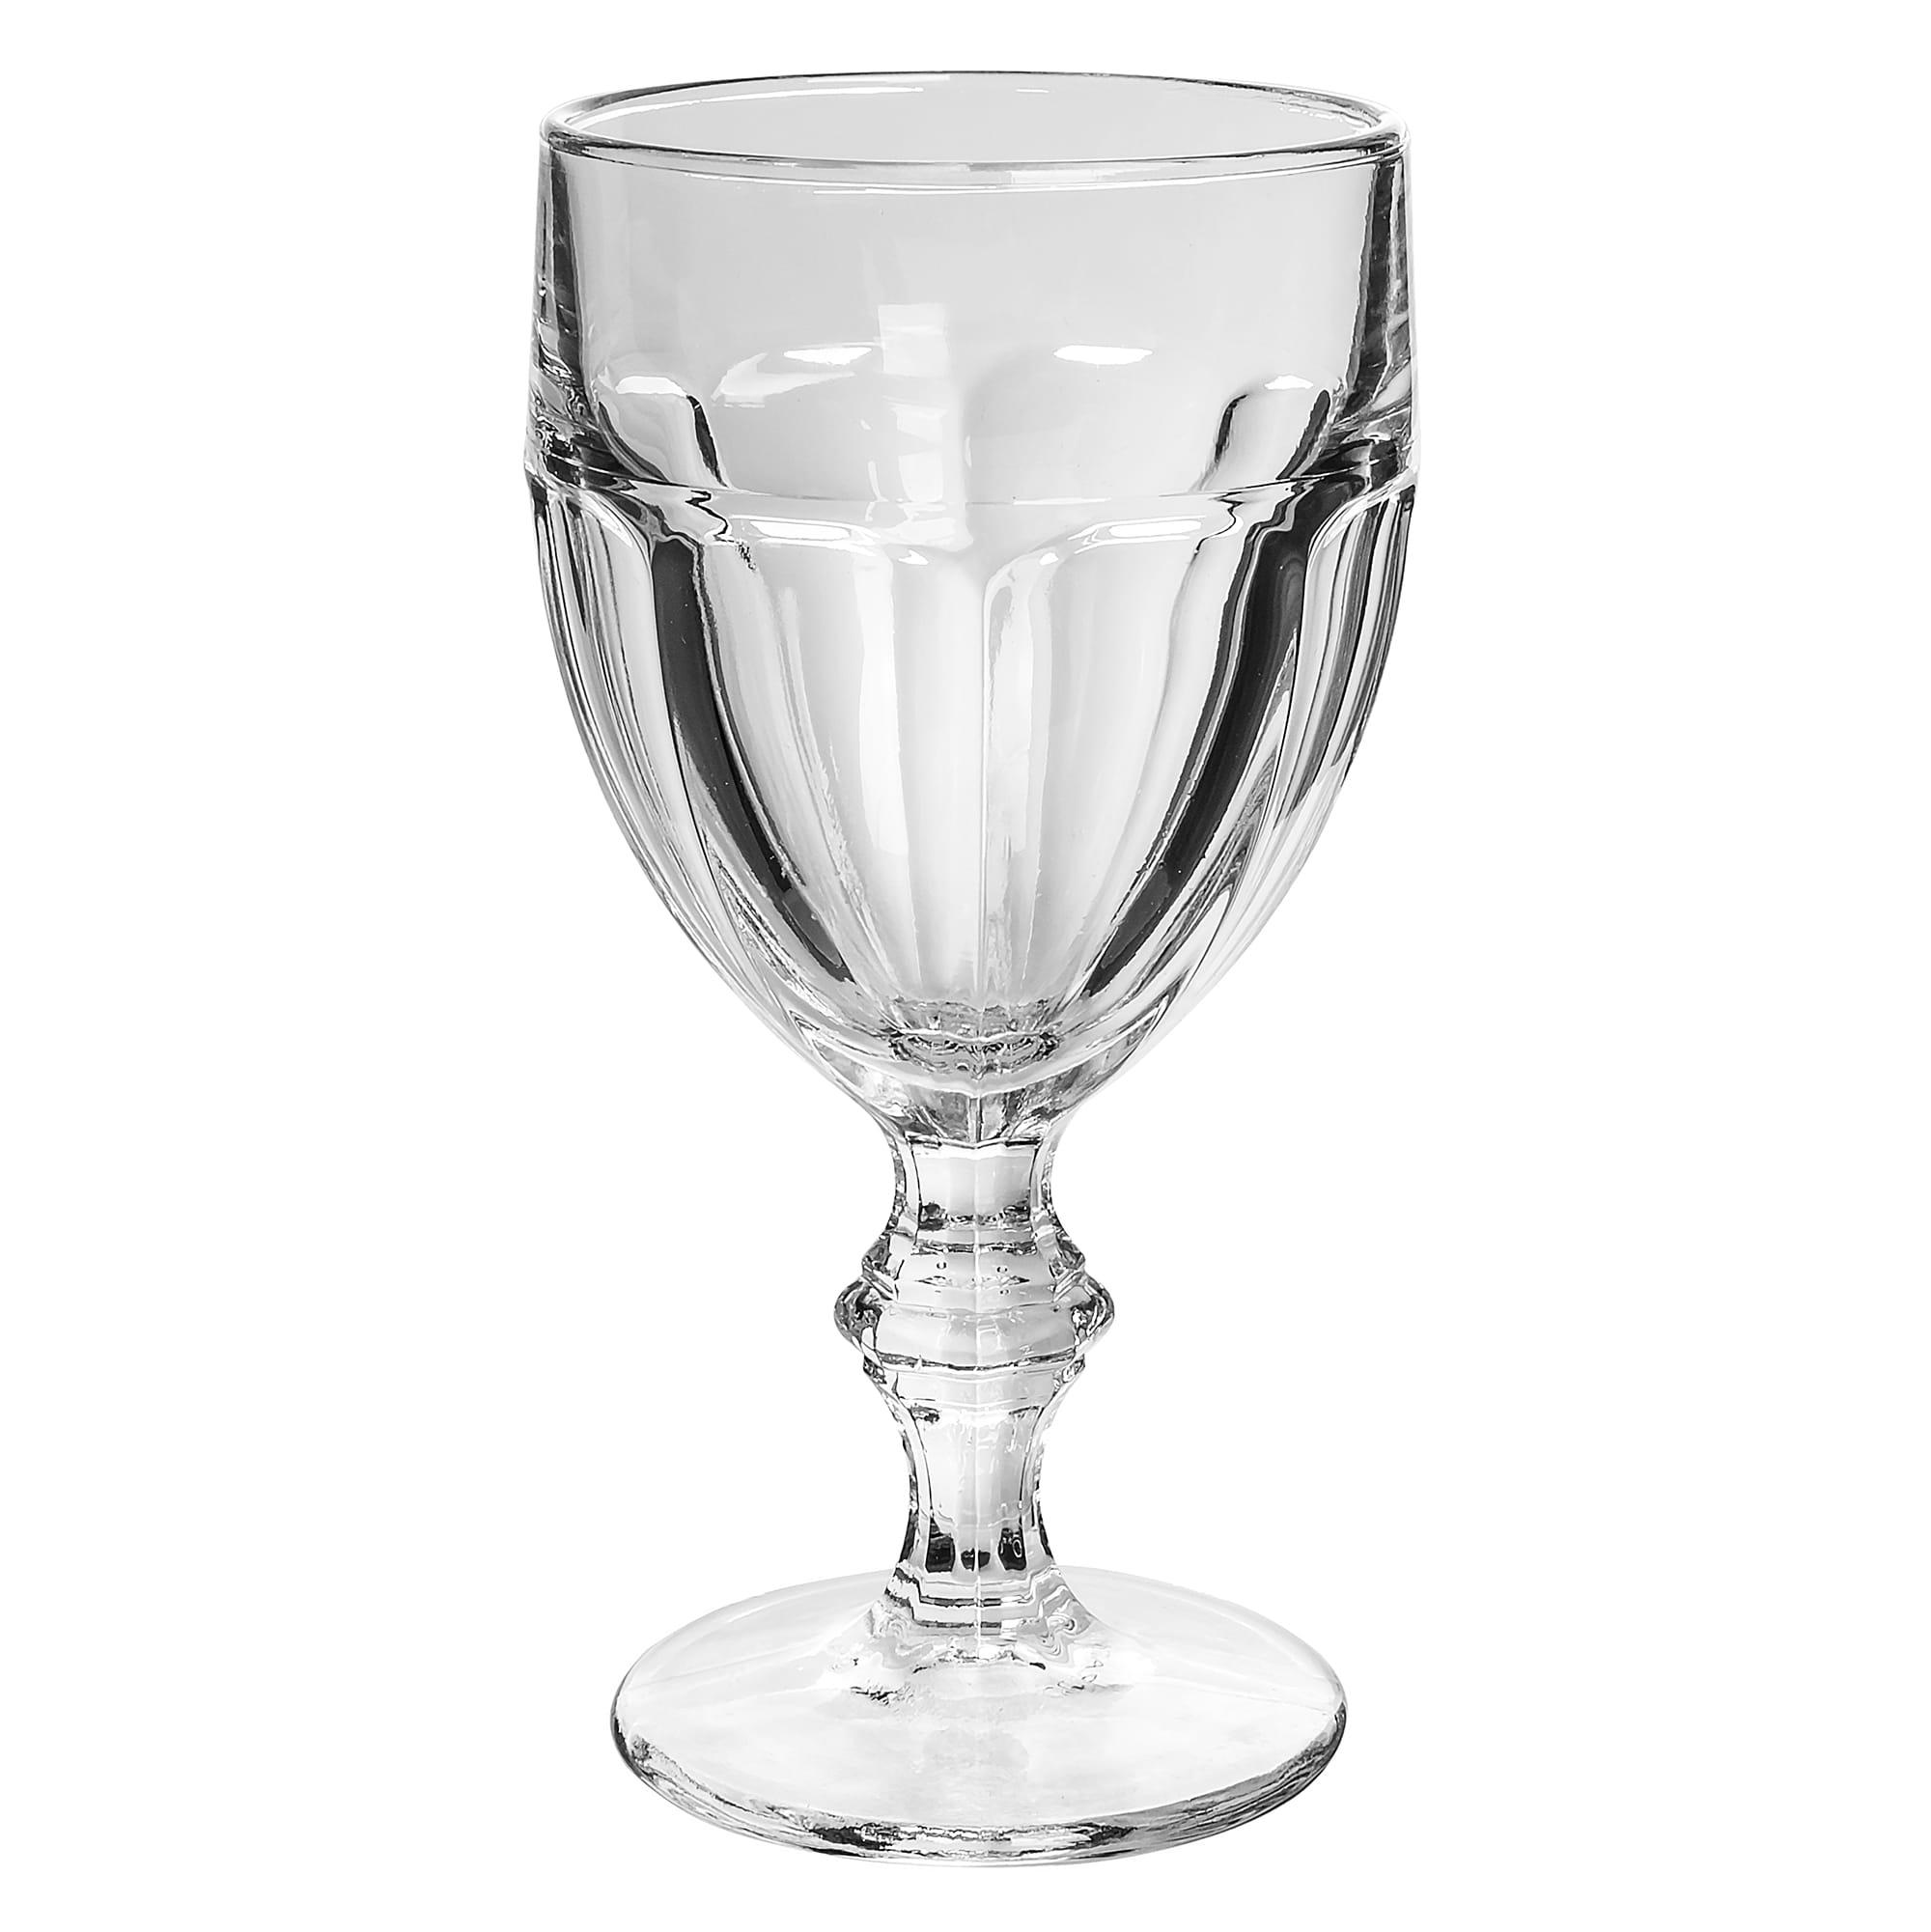 Libbey 15247 11.5 oz DuraTuff Gibraltar Wine Goblet